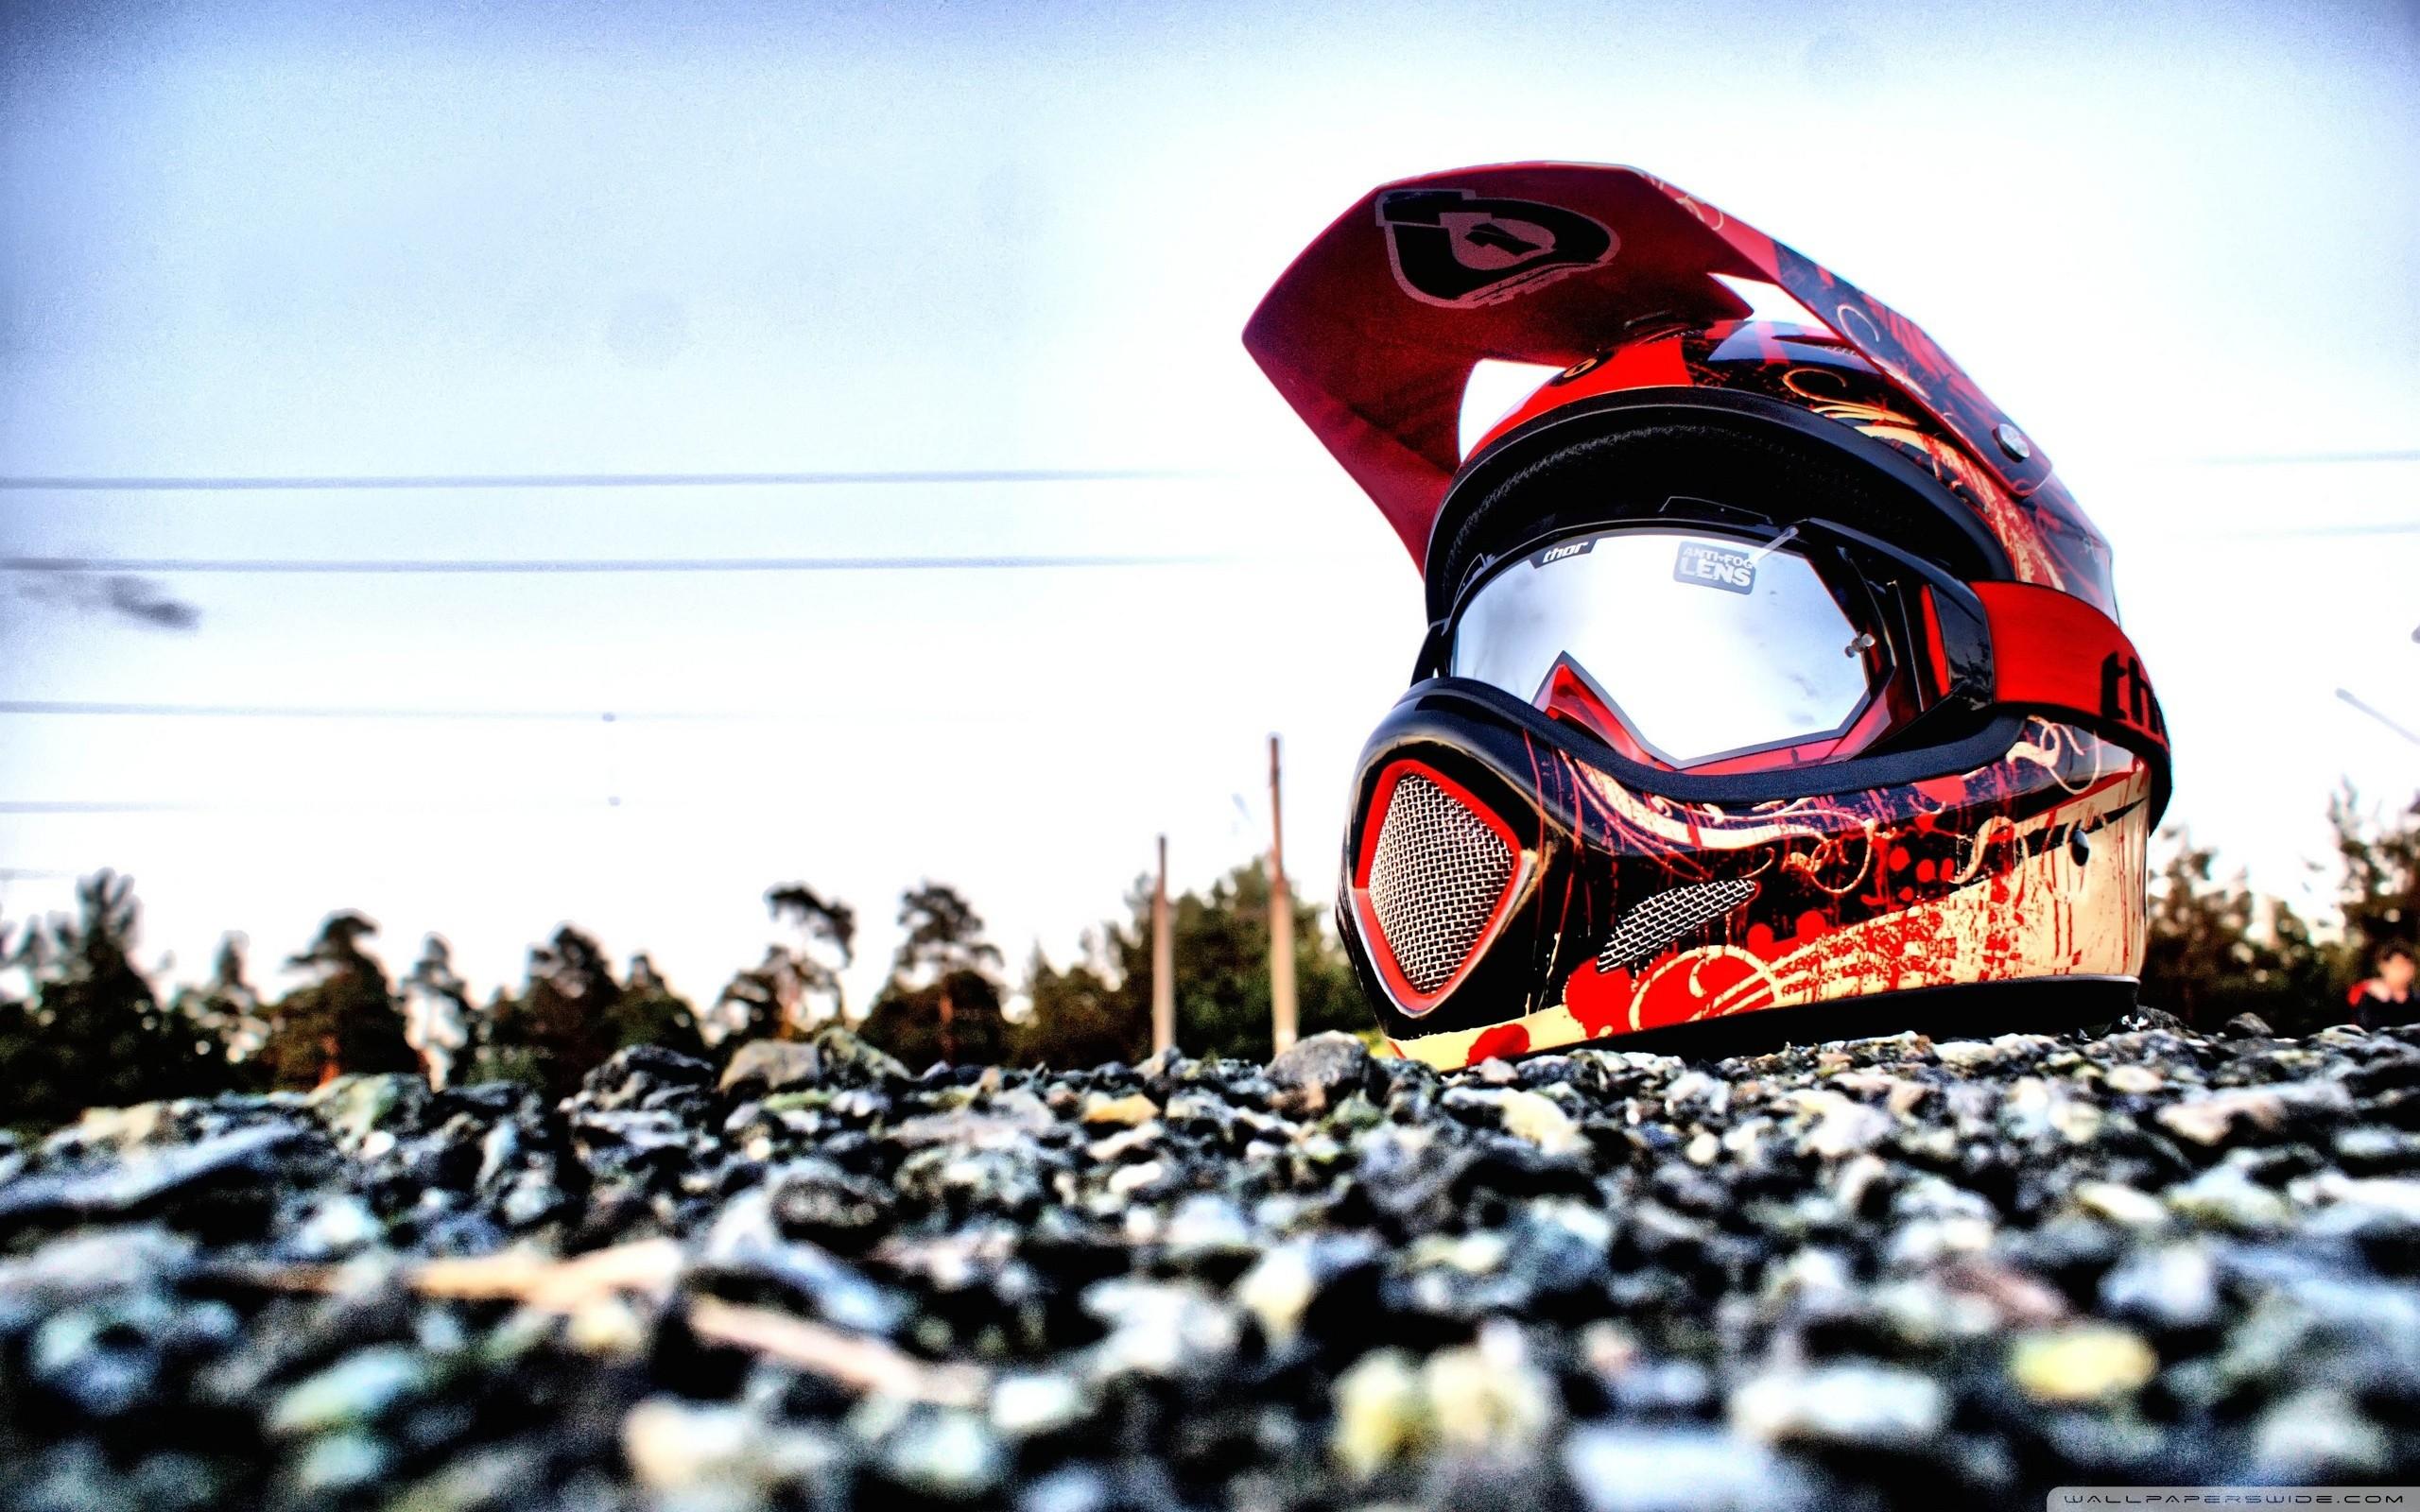 Downhill Biking Helmet HD Wide Wallpaper for Widescreen